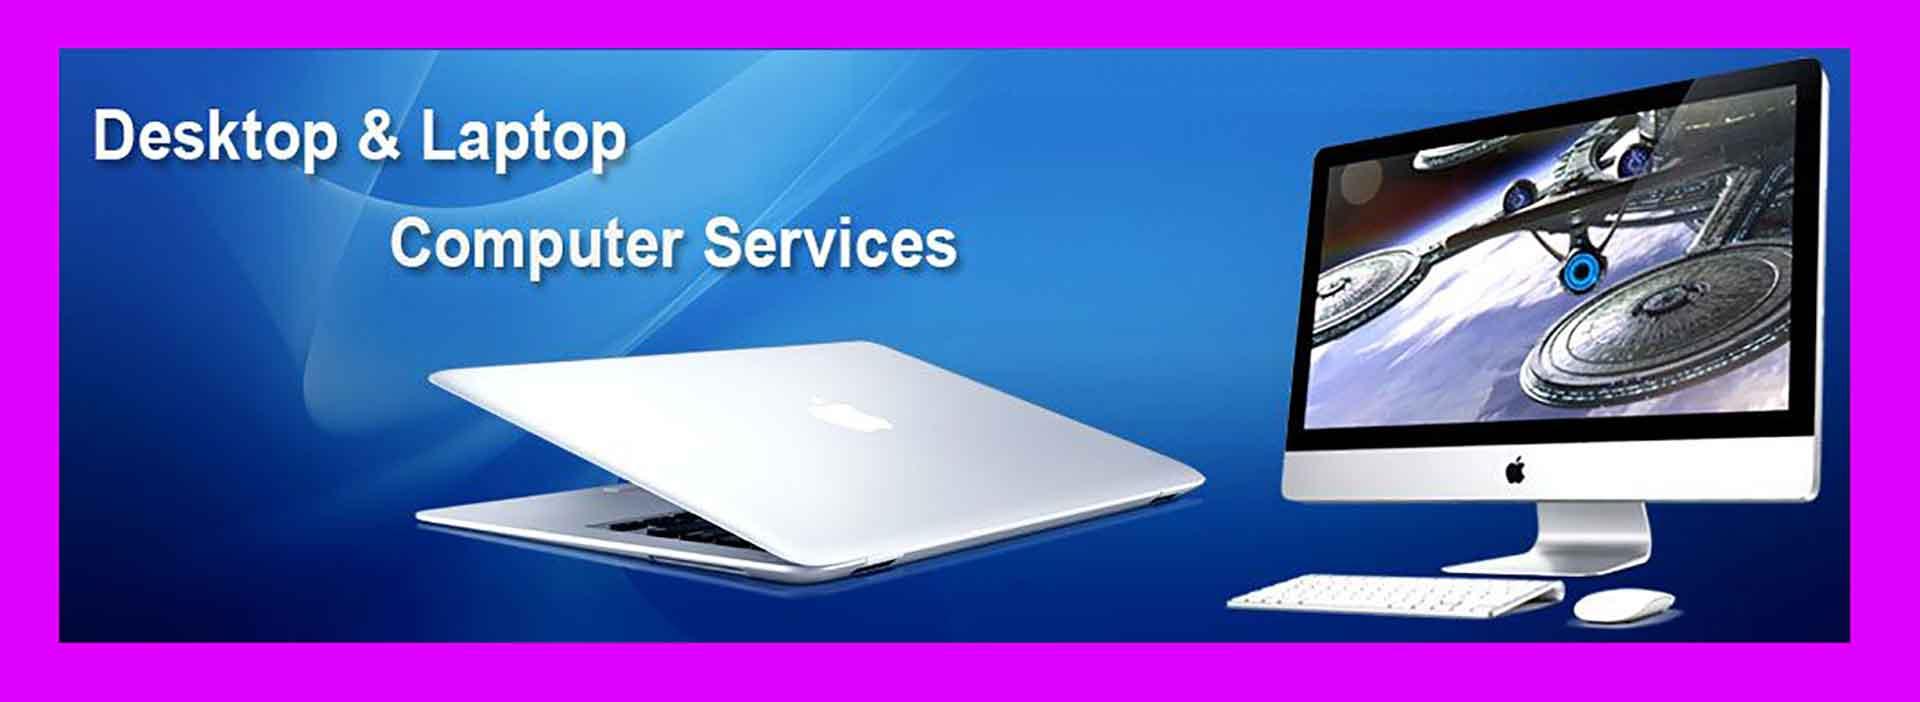 Desktop and laptop computer service